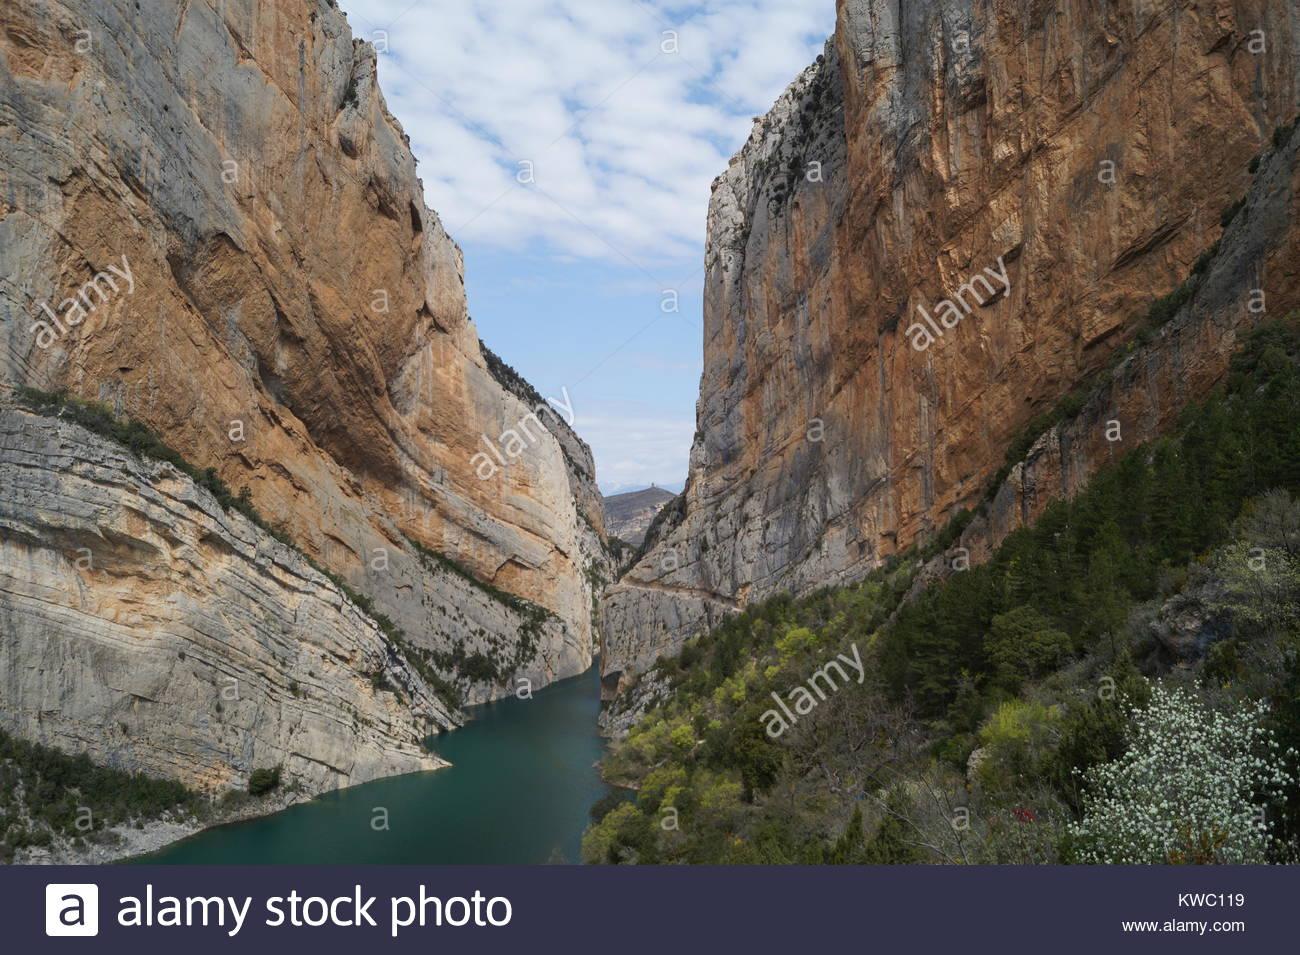 Congost de Mont-rebei - Desfiladero de Monrrebey - Stock Image